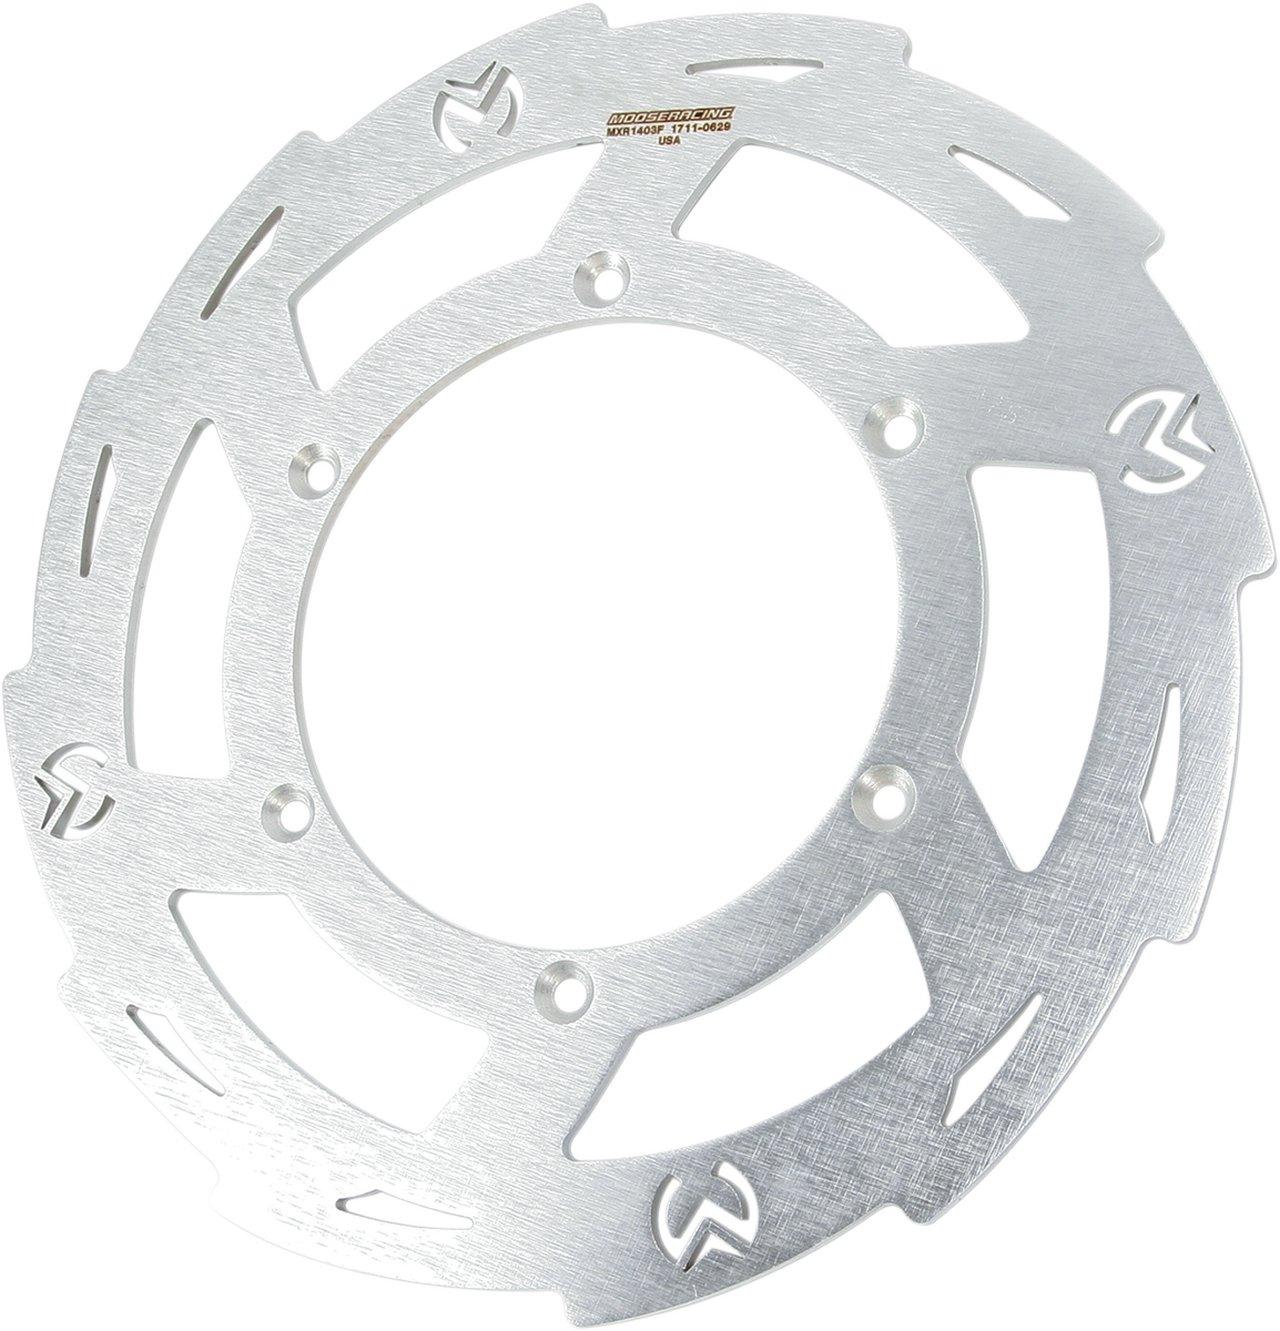 【MOOSE RACING】MXR BLADE 煞車碟盤 [1711-0629] - 「Webike-摩托百貨」